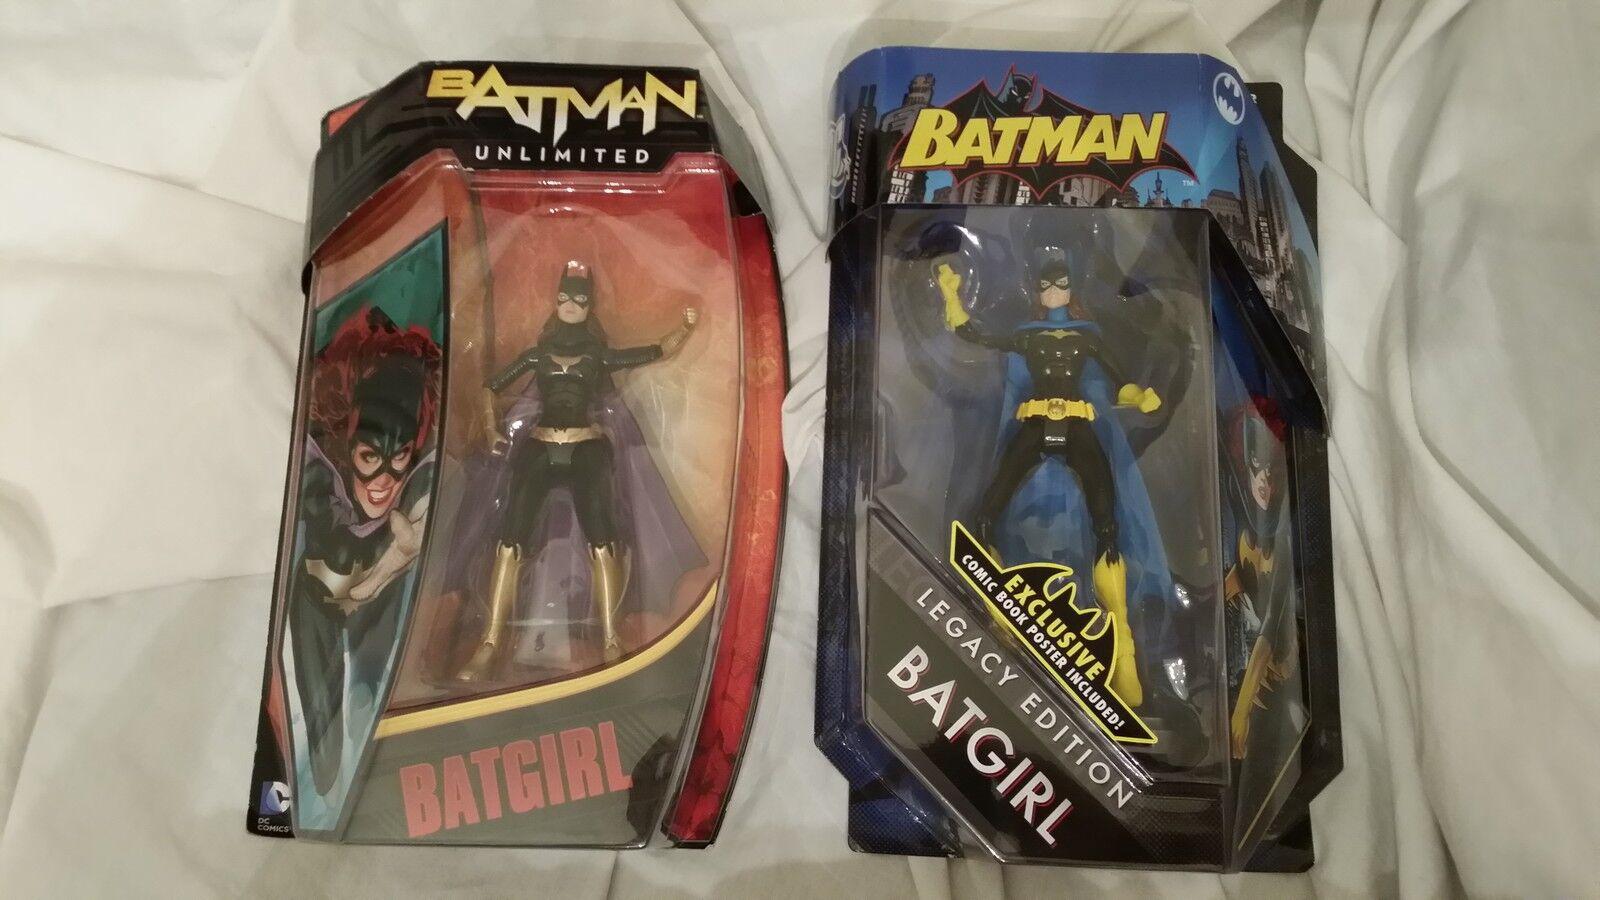 Batgirl unbegrenzte & batgirl legacy edition zahlen